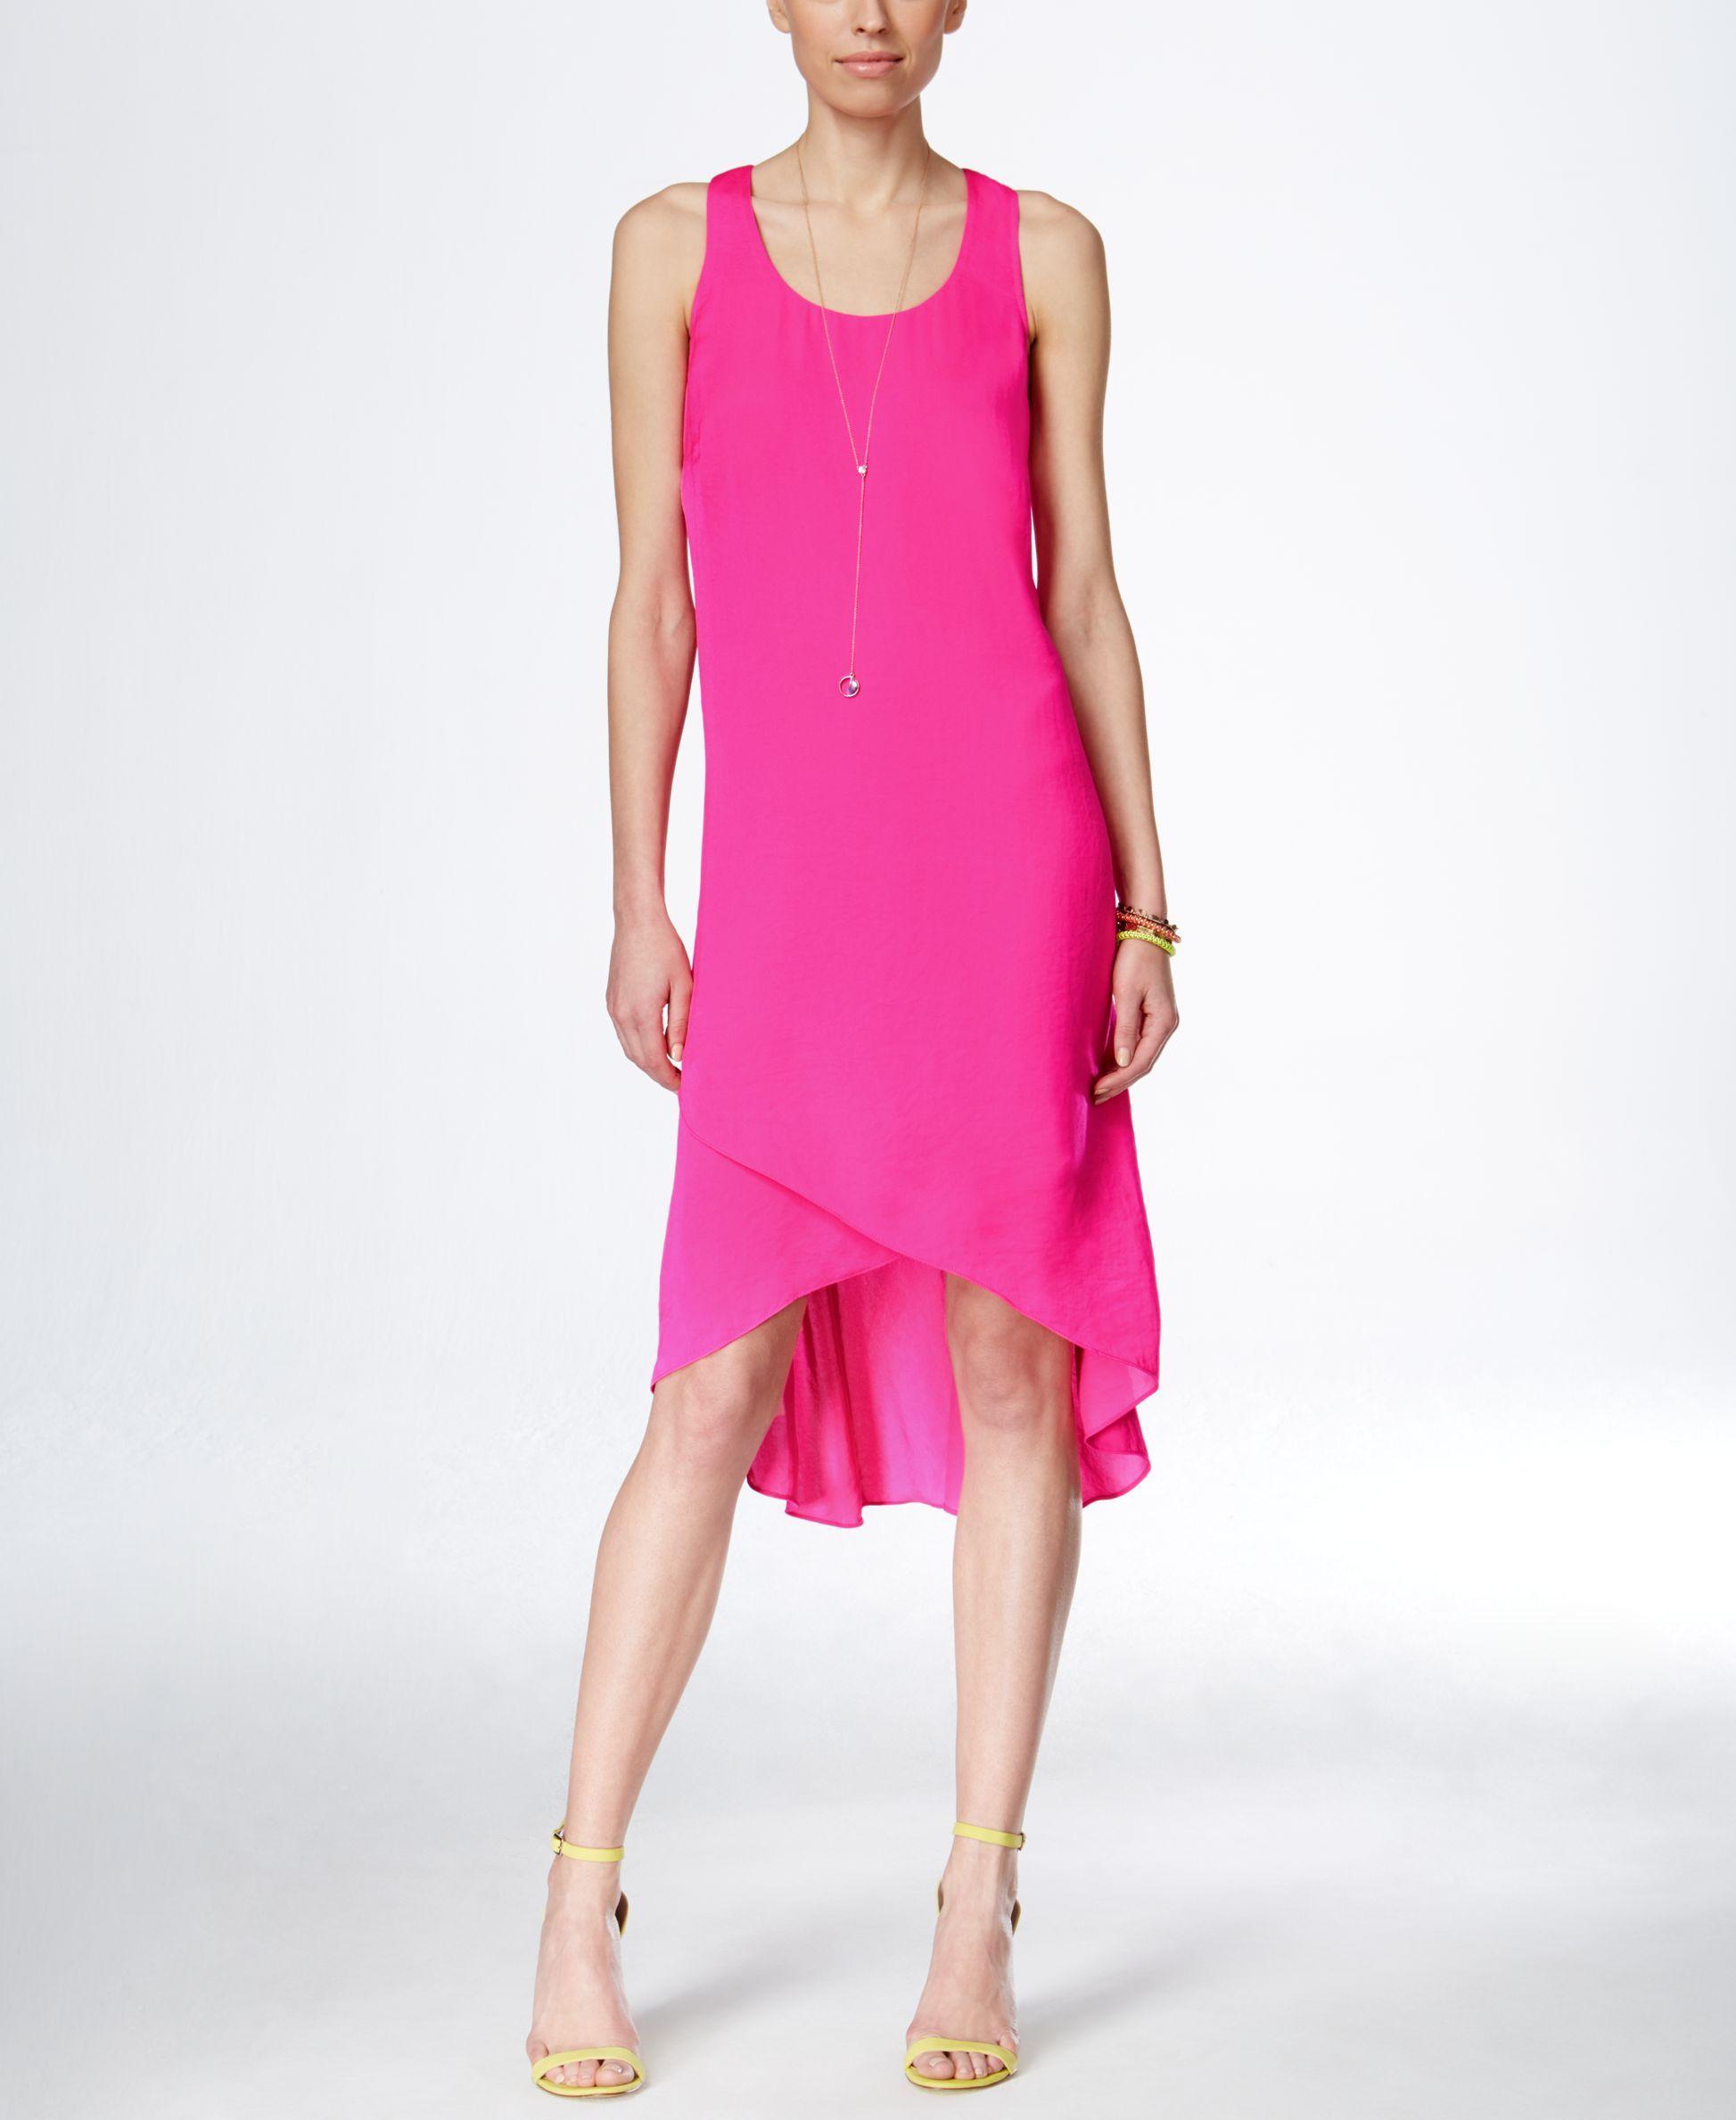 84ed4657b2 Inc International Concepts Sleeveless High-Low Dress